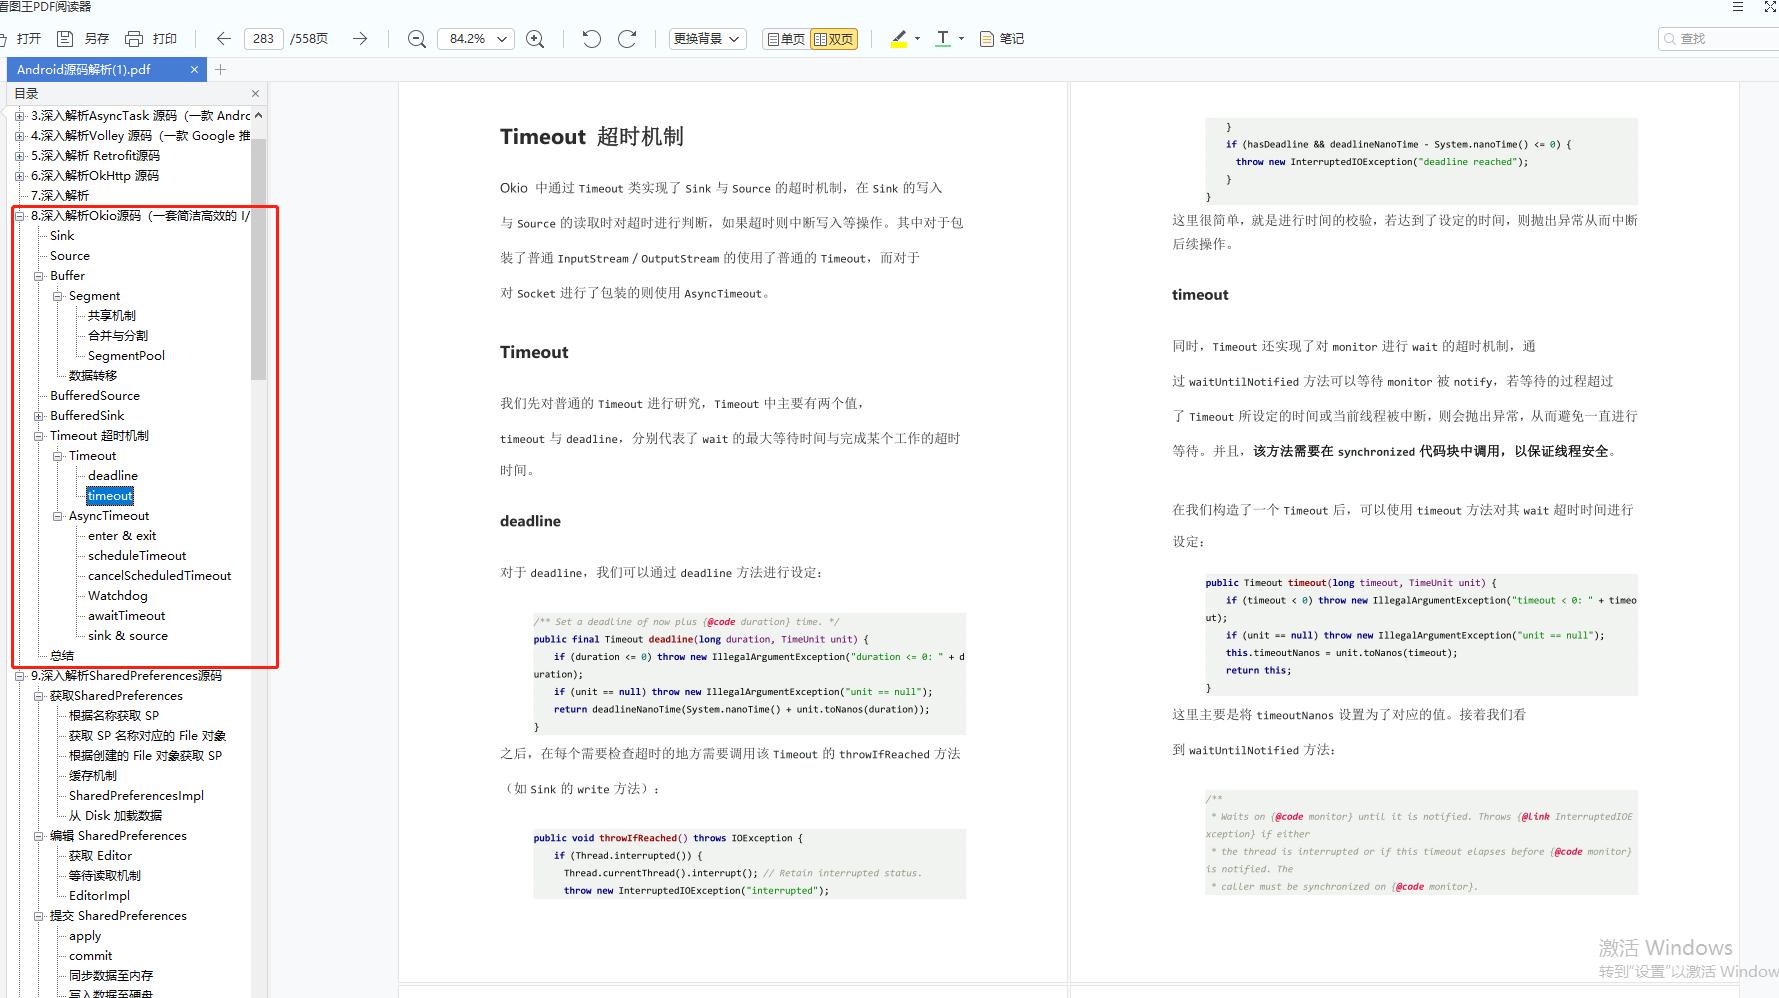 还怕问源码?Github上神级Android三方源码解析手册,已有7.6 KStar